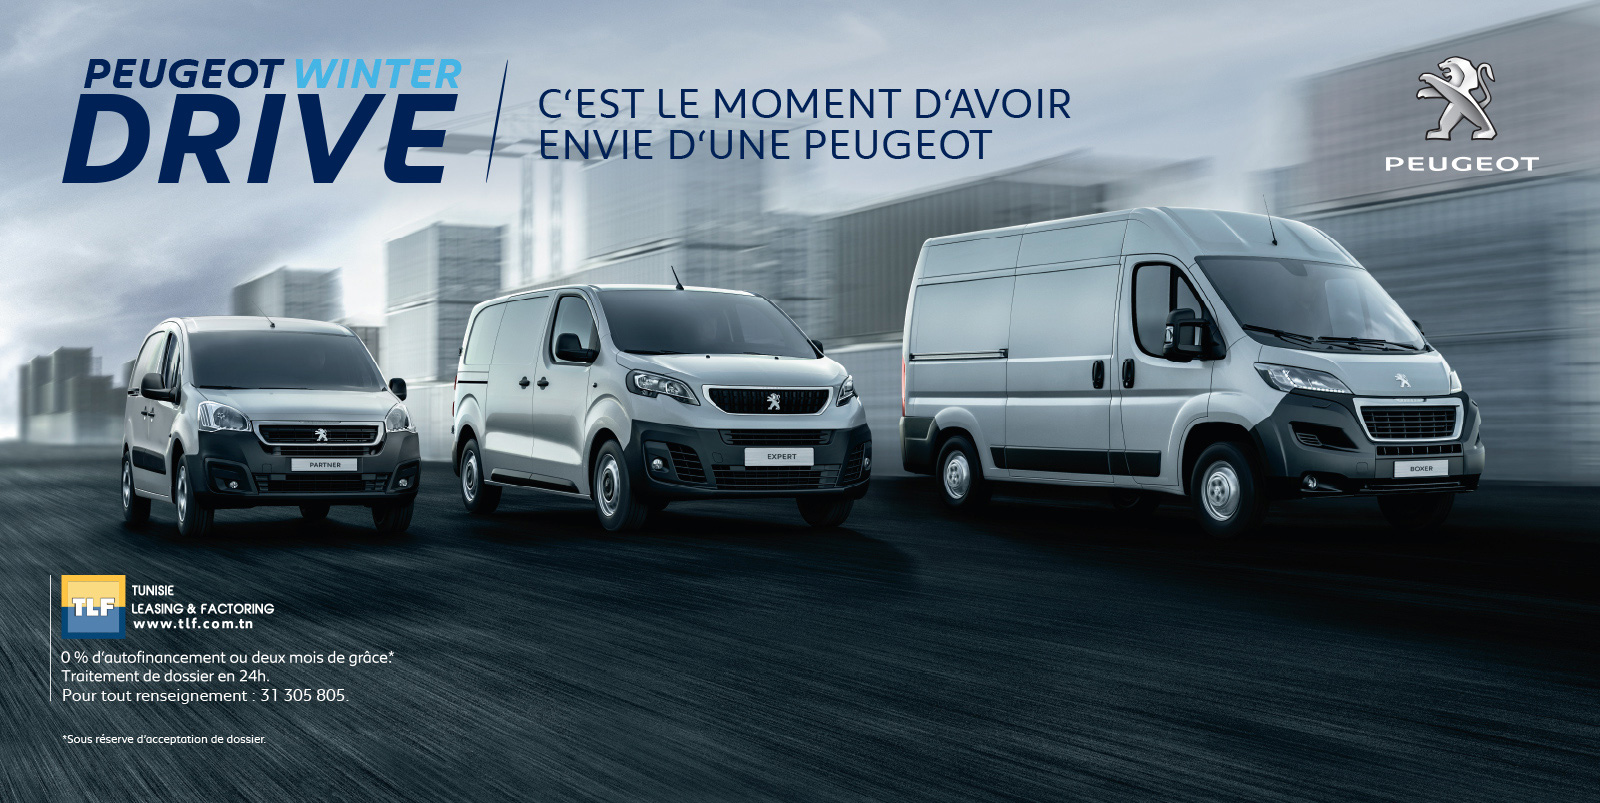 Peugeot Winter Drive chez STAFIM